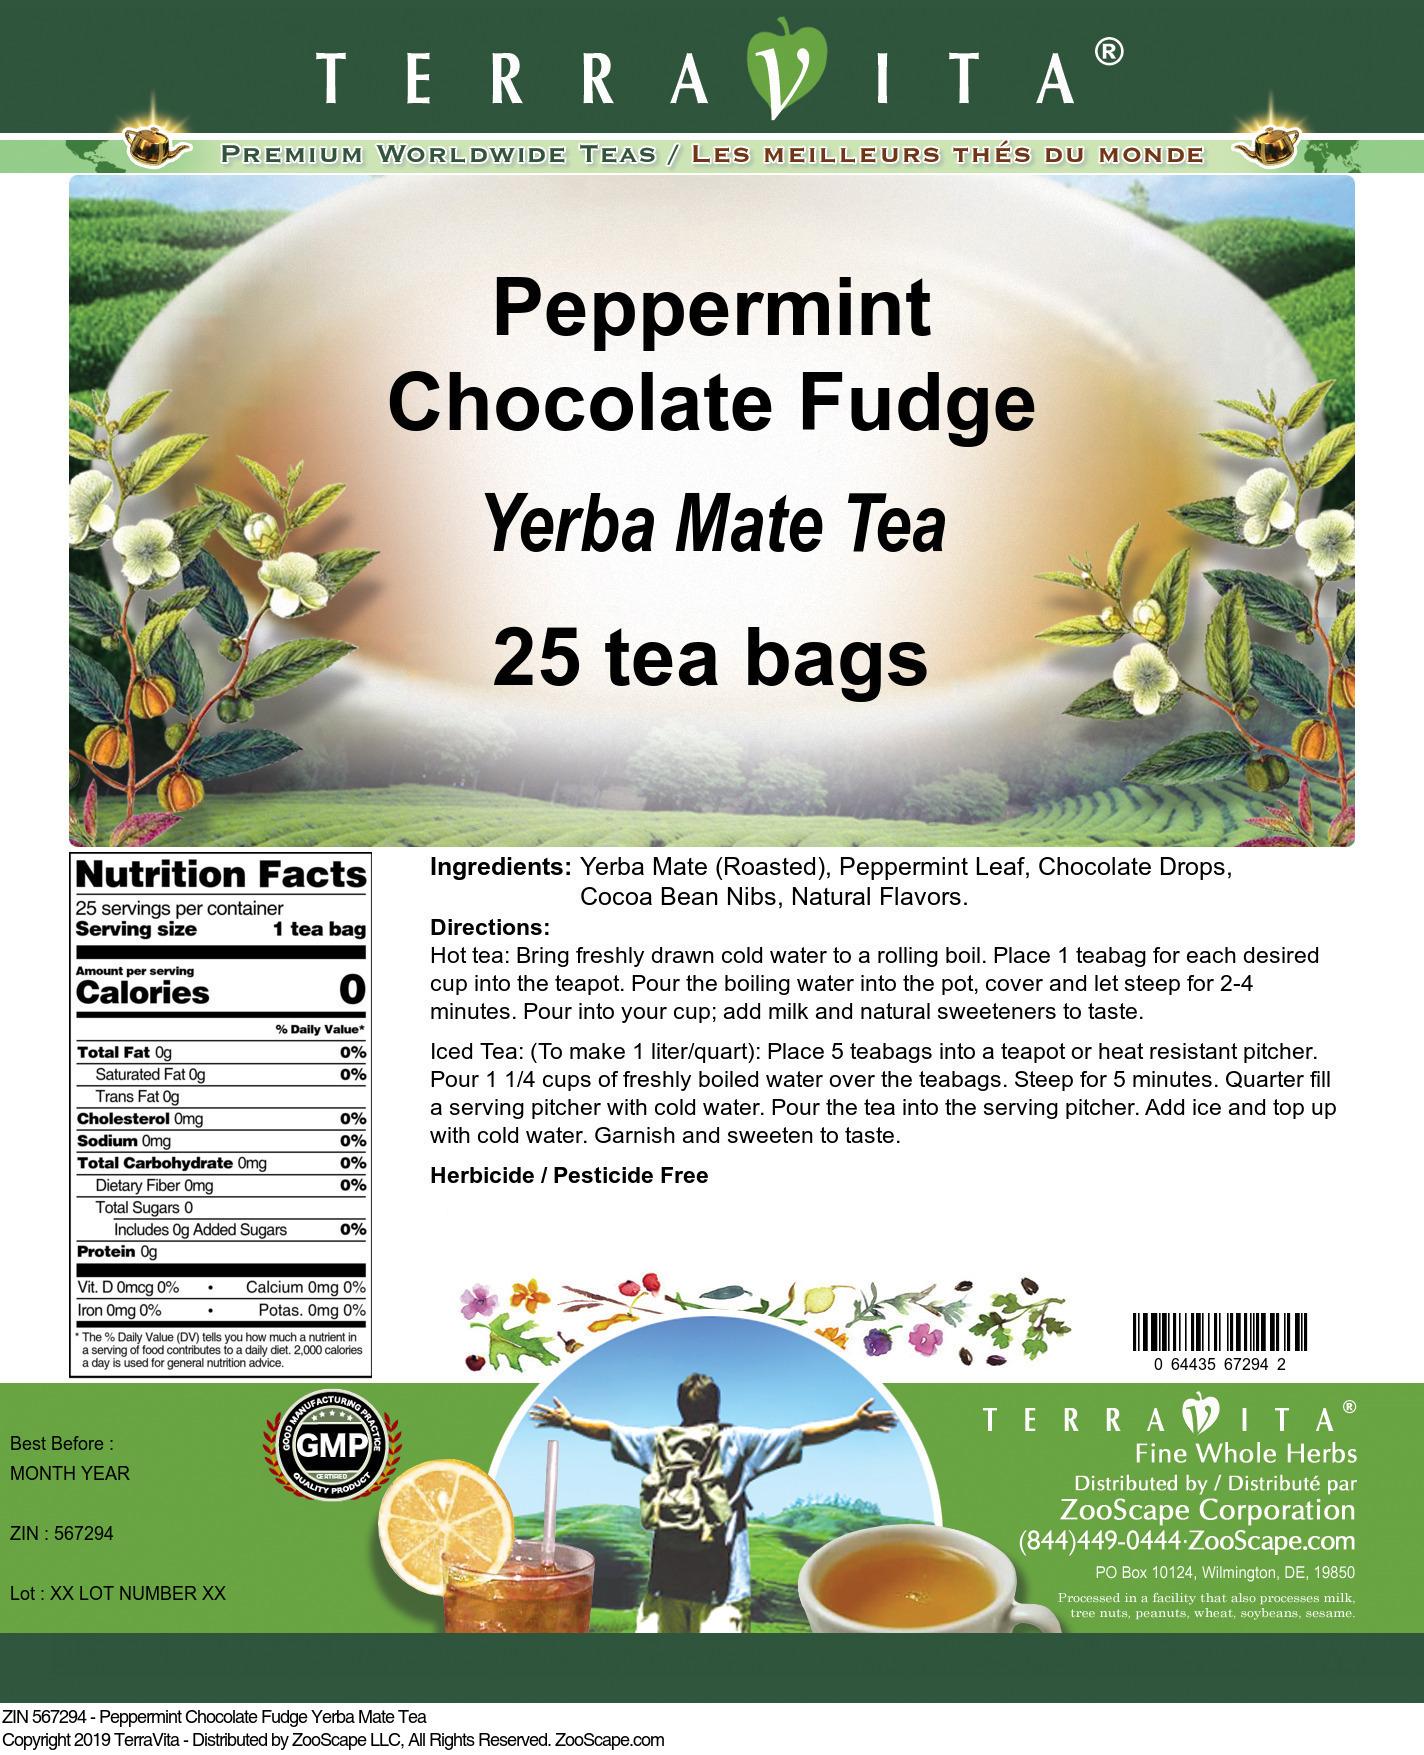 Peppermint Chocolate Fudge Yerba Mate Tea